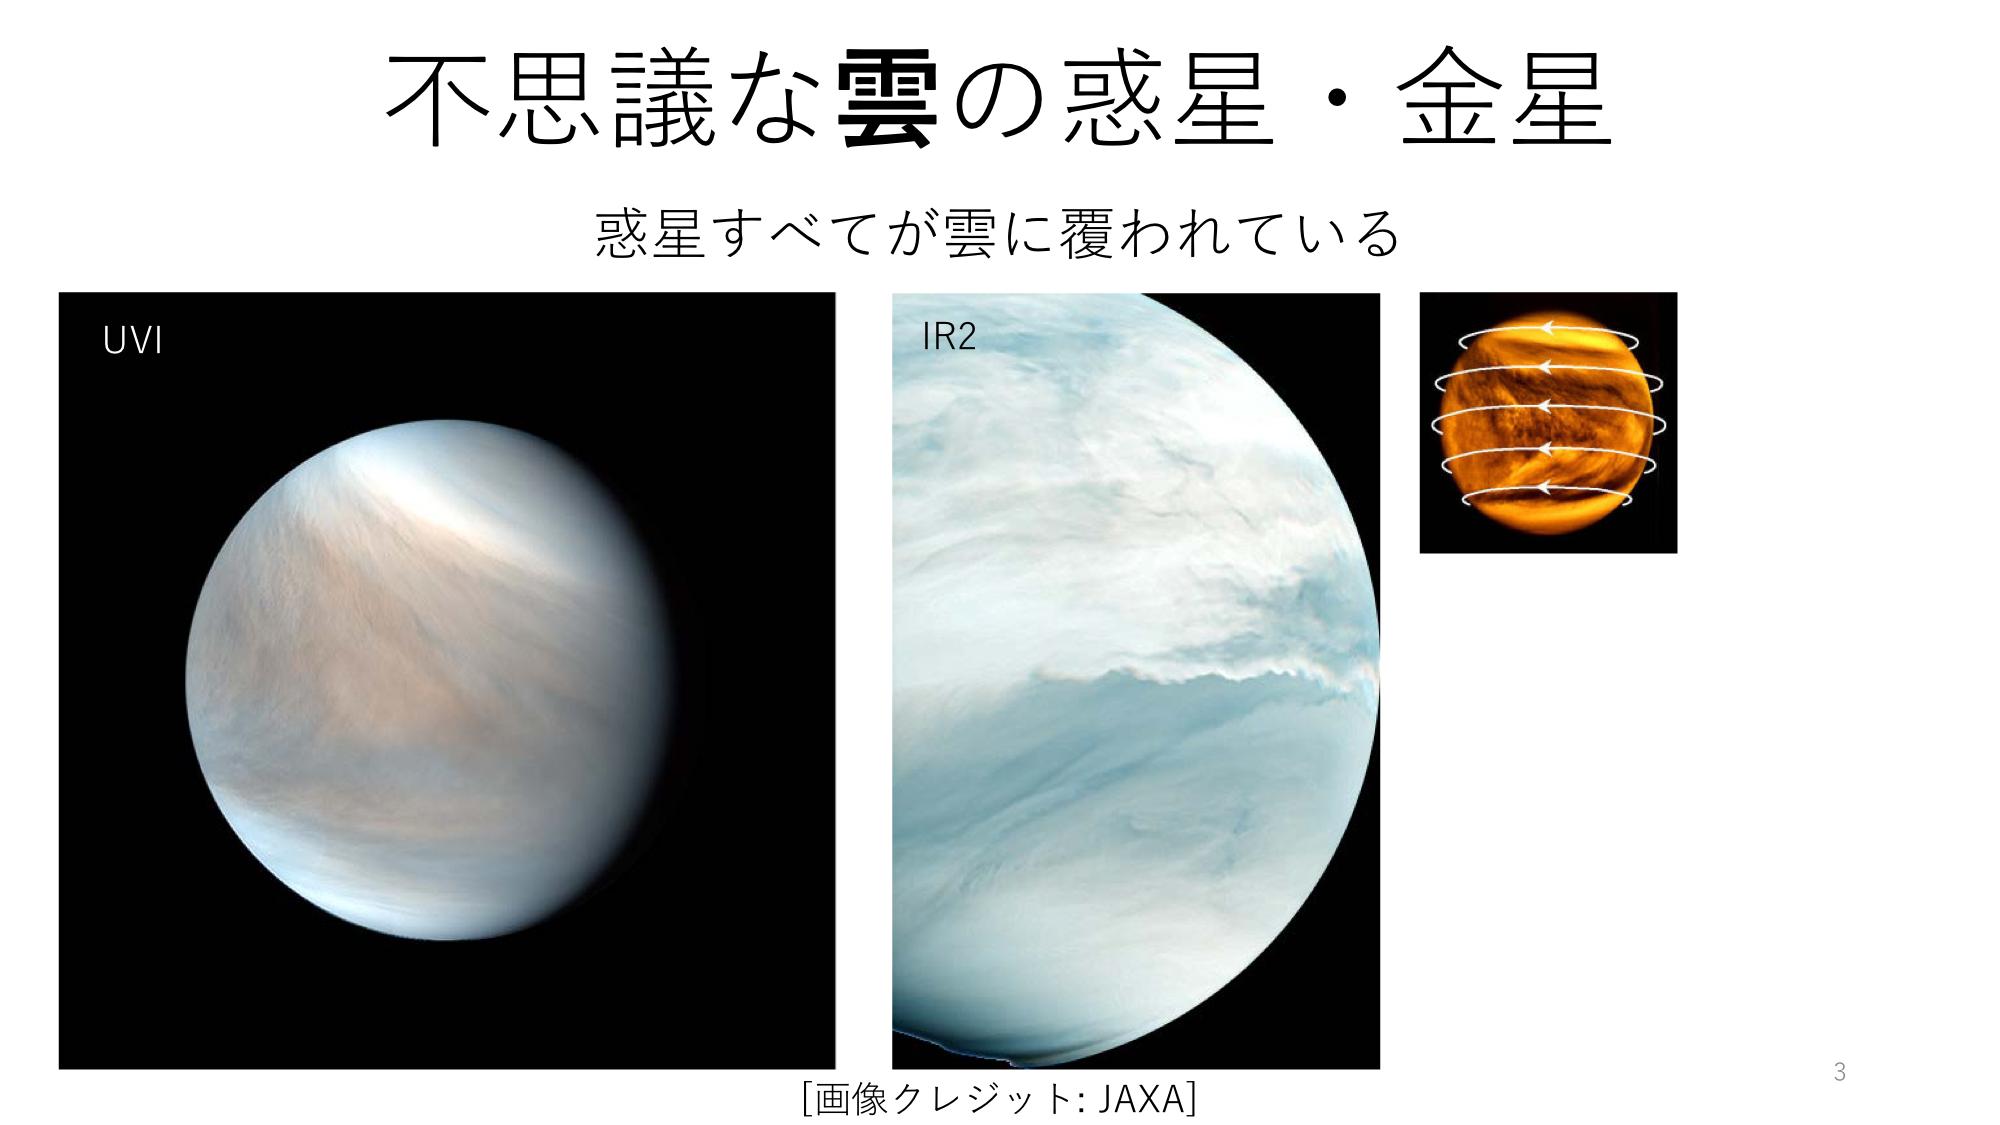 f:id:Imamura:20191119205339p:plain